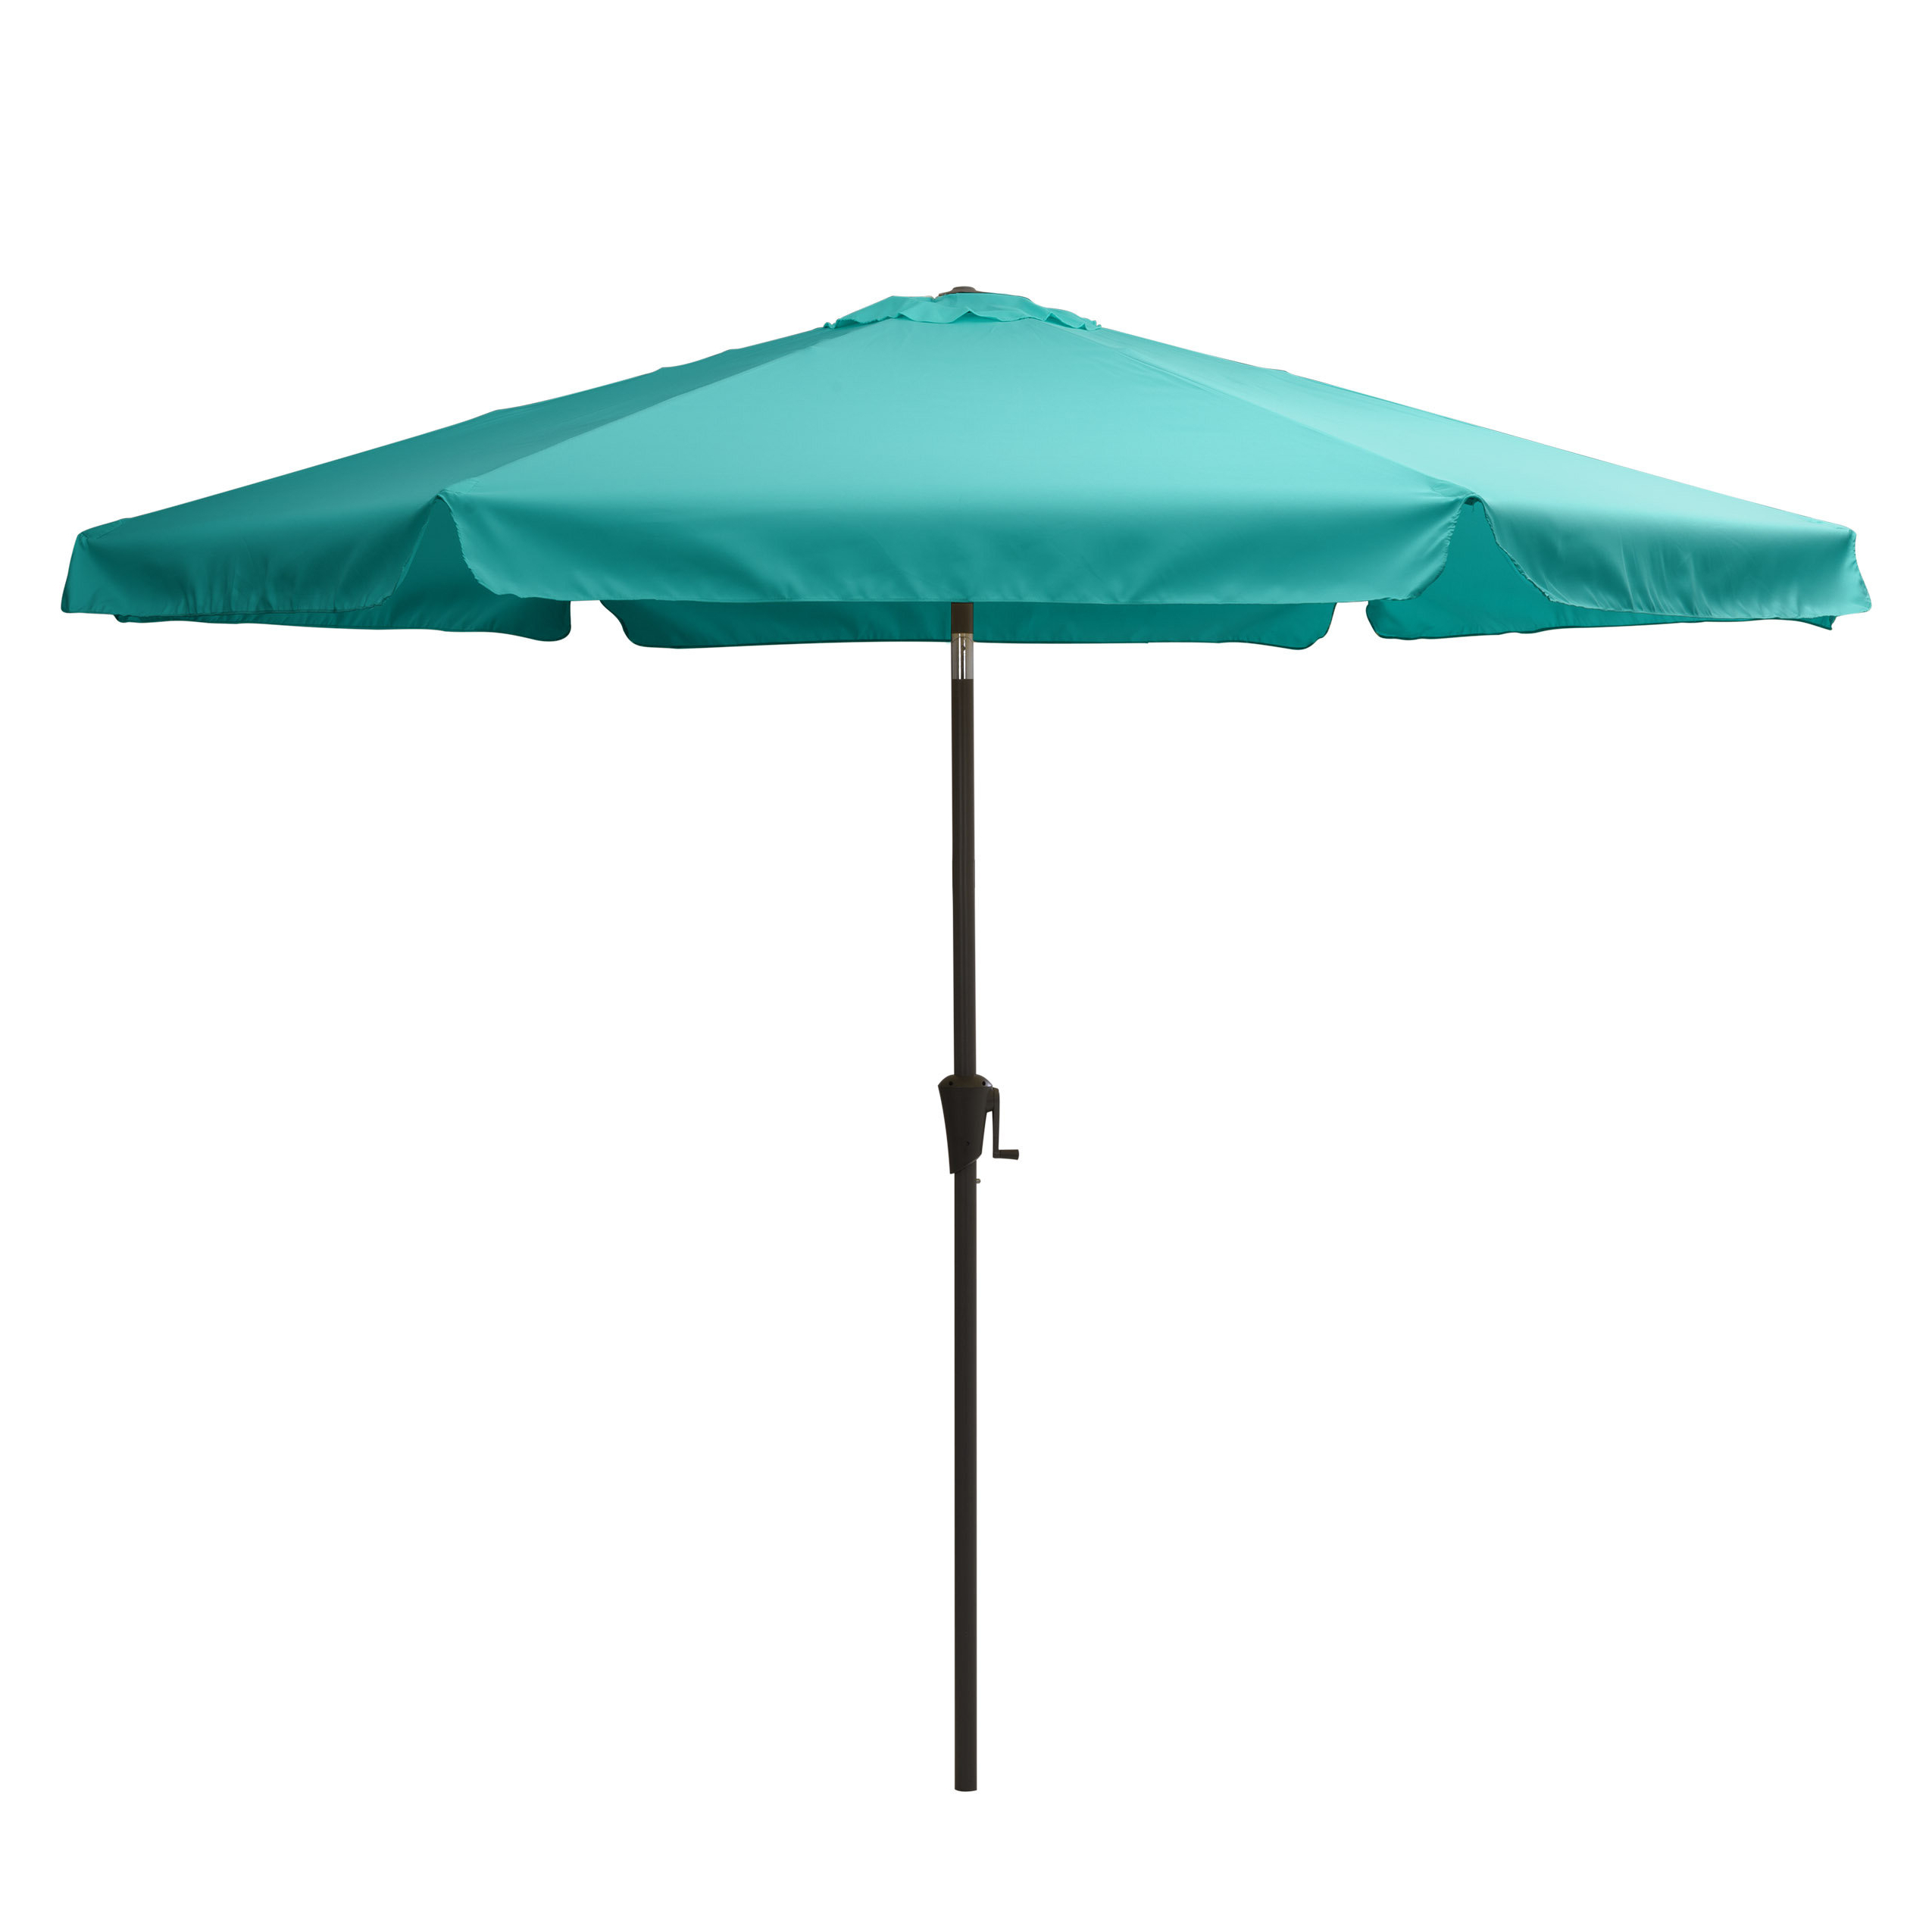 Pedrick Drape Market Umbrellas Pertaining To Most Up To Date Crowborough 10' Market Umbrella (View 13 of 20)